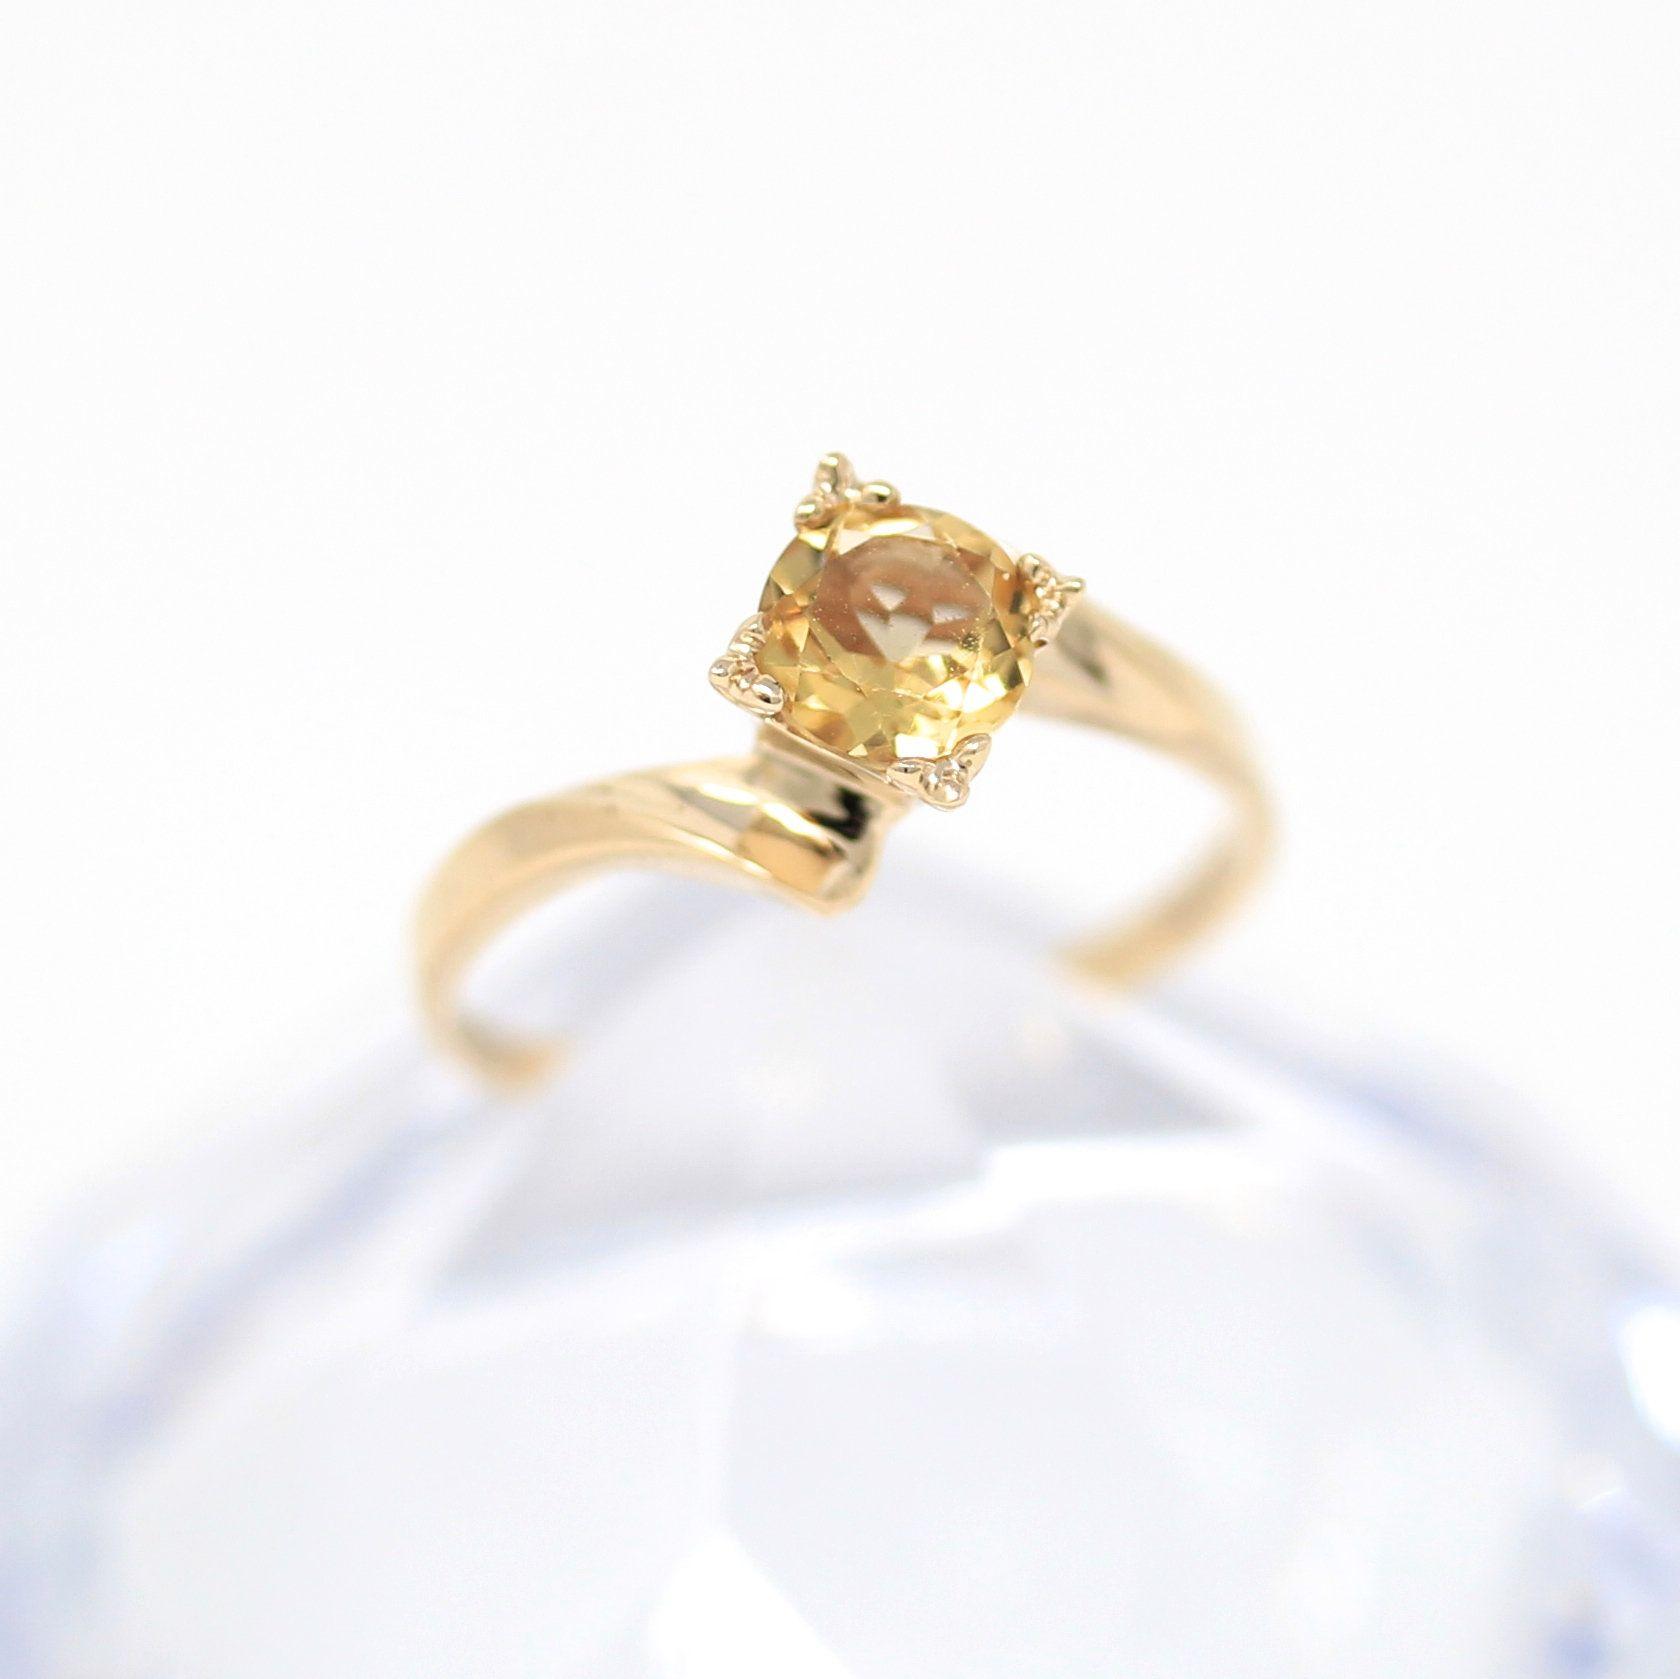 Vintage Citrine Ring 10k Yellow Gold Bypass Ring Size 6 1 2 Retro 1960s Yellow 62 Ct November Birthstone Fine Retro Jewelry Genuine Citrine Modern Jewelry